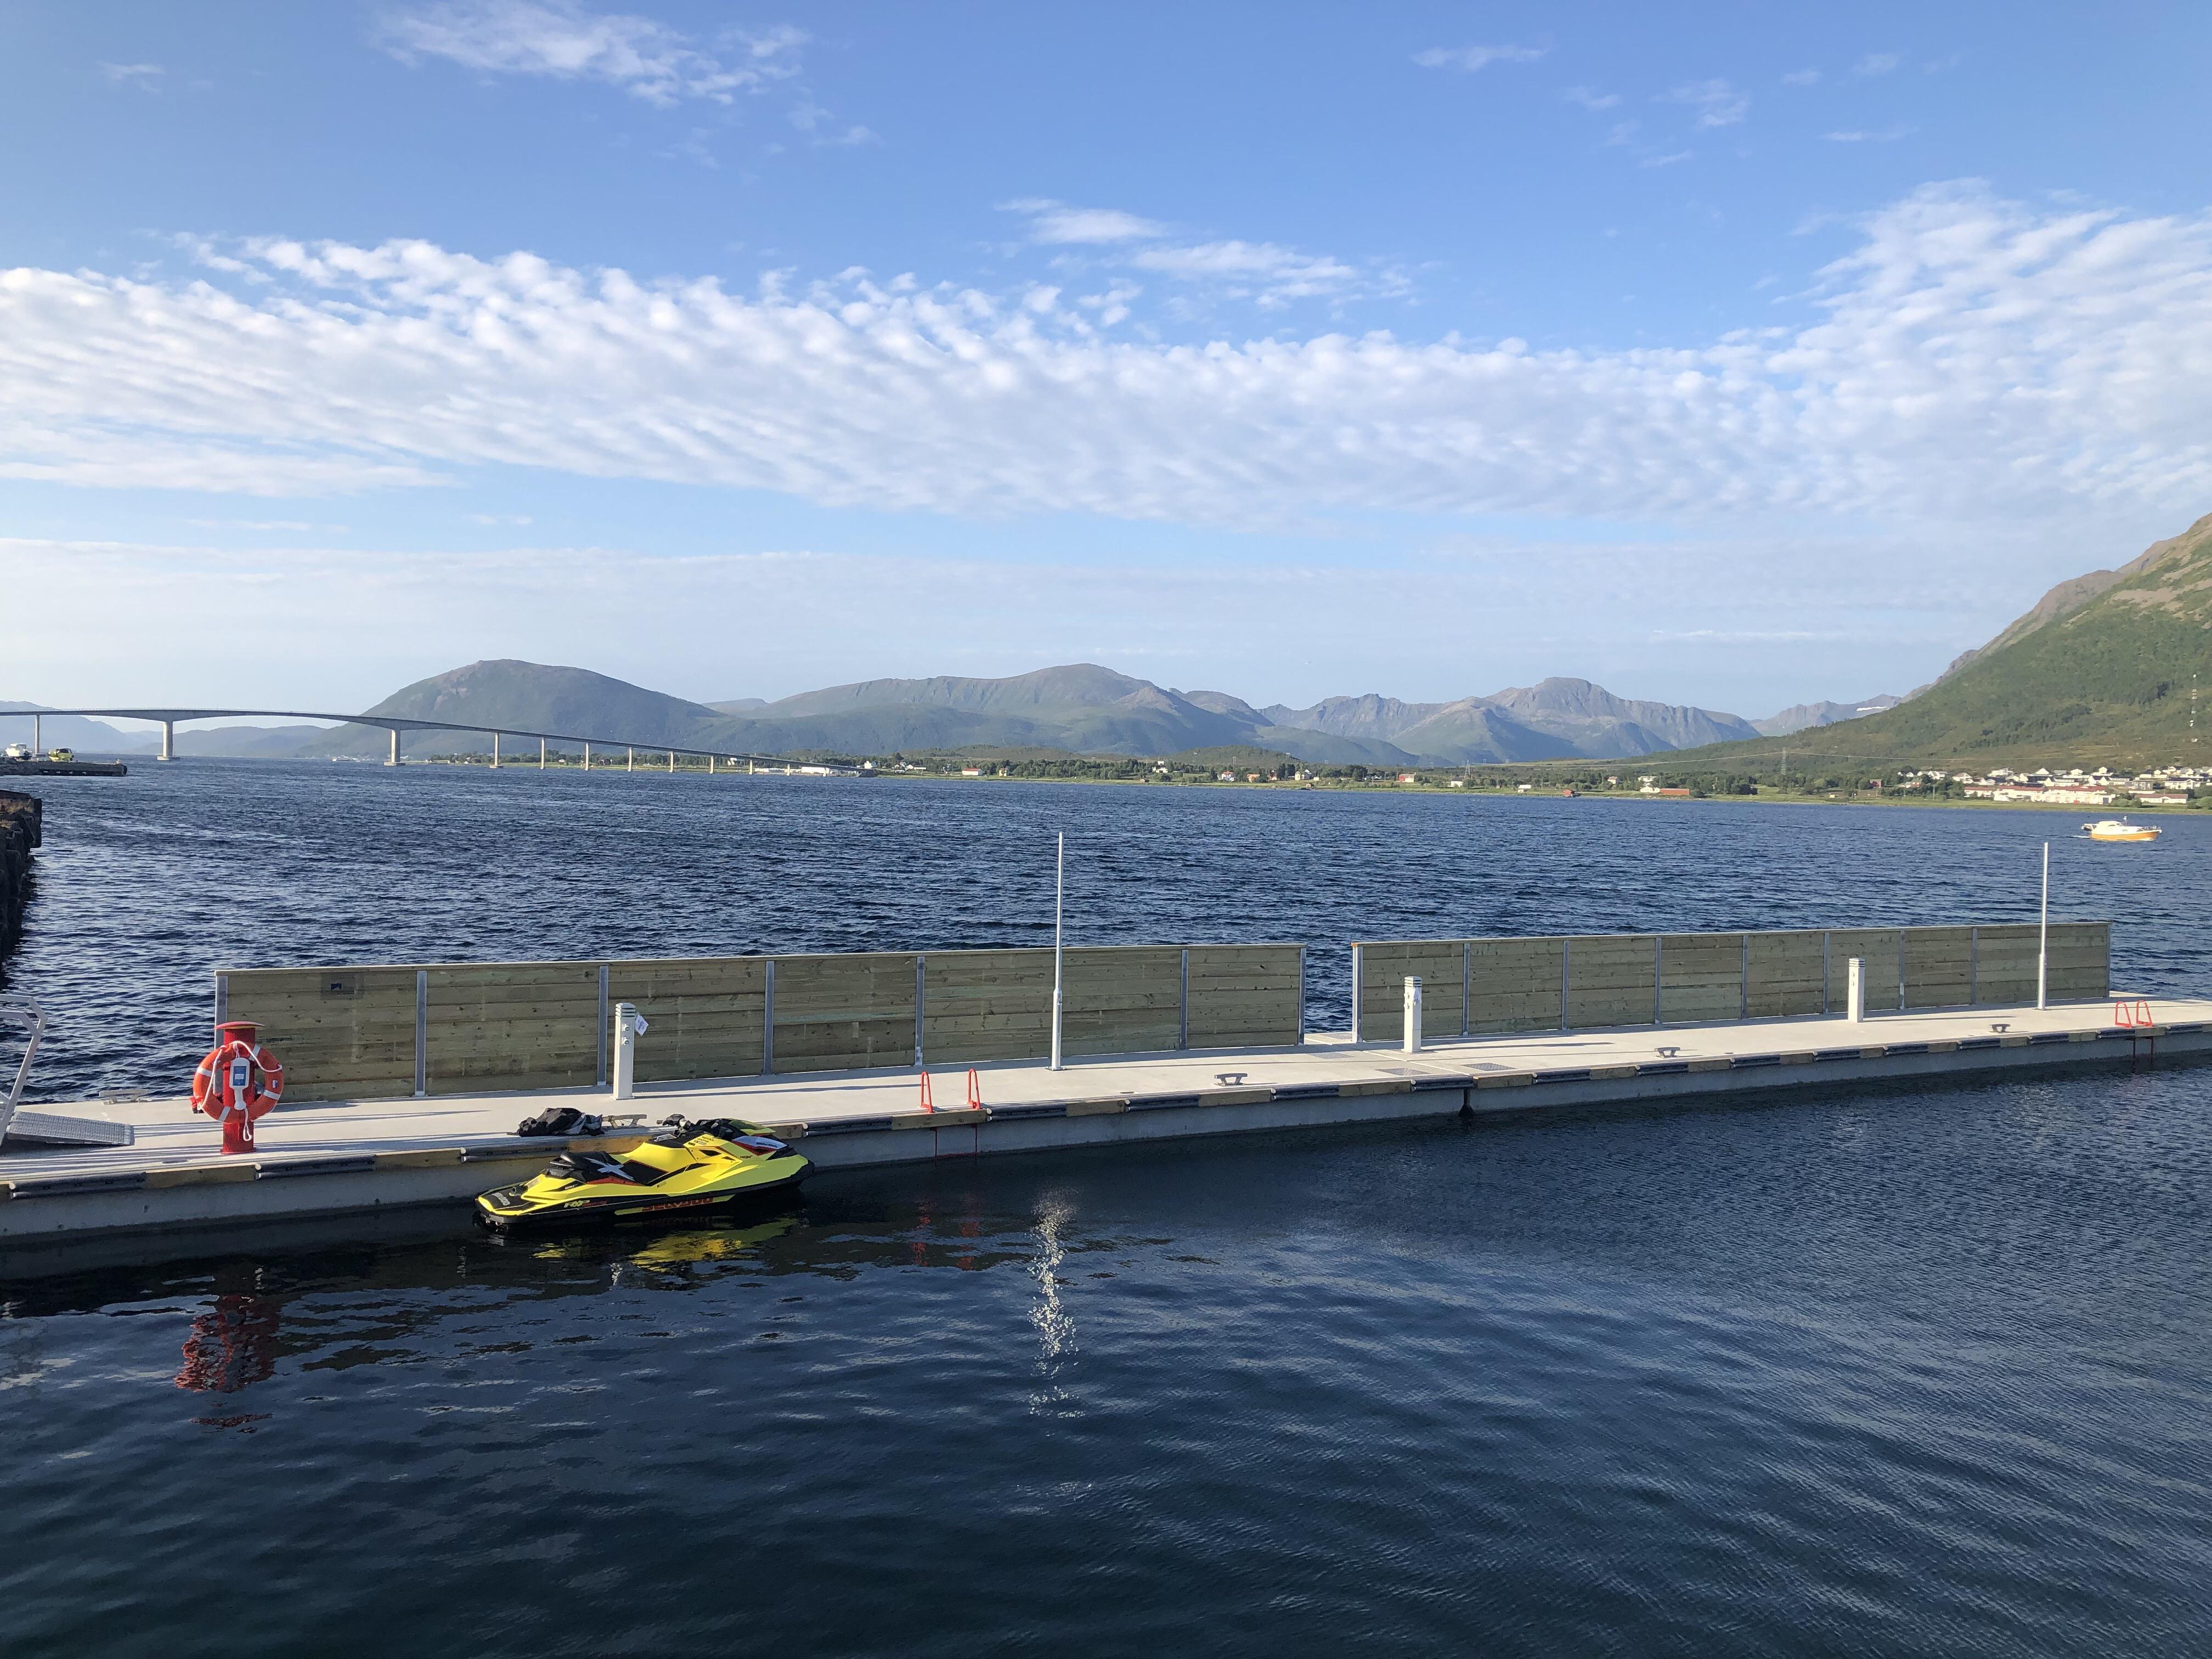 https://www.marinasolutions.no/uploads/Flytebrygger-Sortland-Torghuken-2.JPG